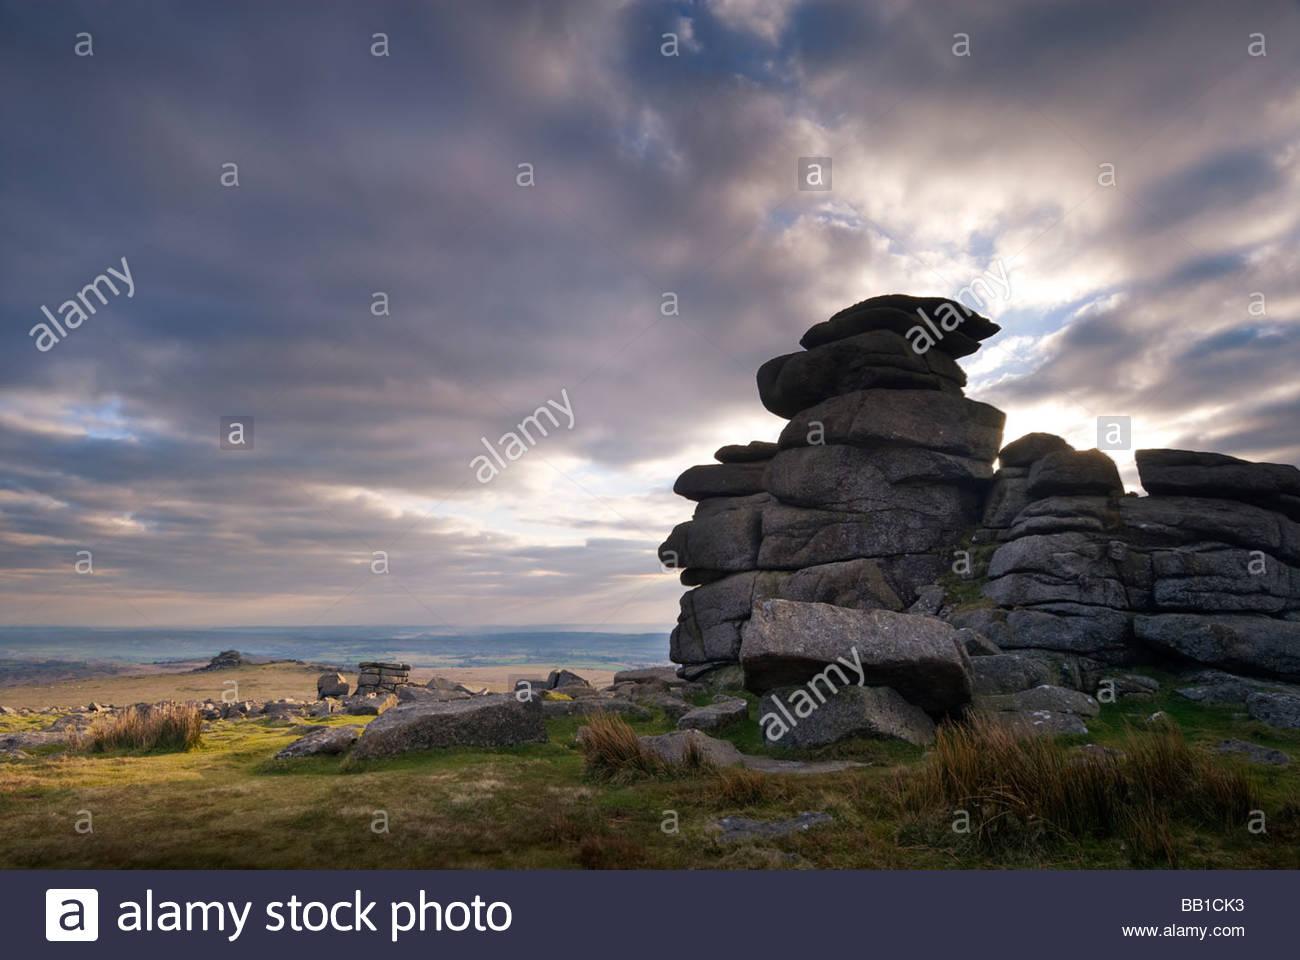 Great Staple Tor, Dartmoor National Park, Devon, England, UK. - Stock Image